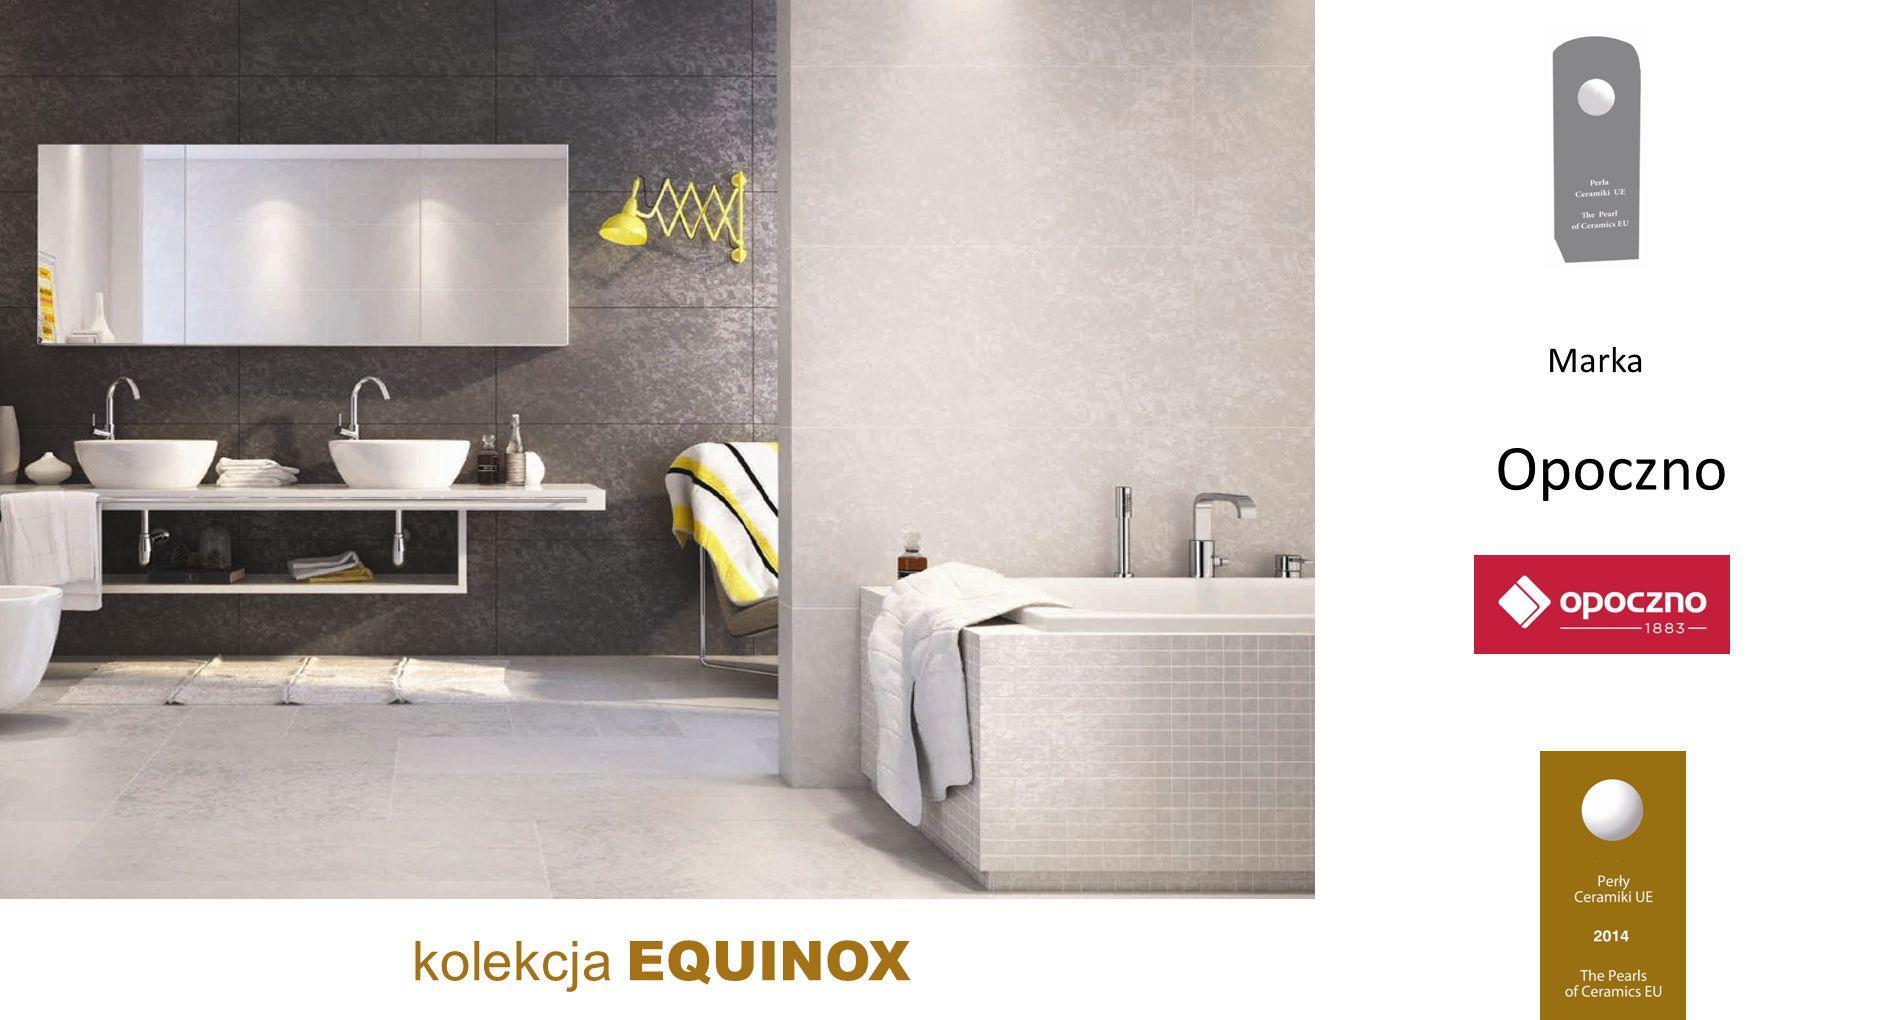 kolekcja EQUINOX Opoczno Marka